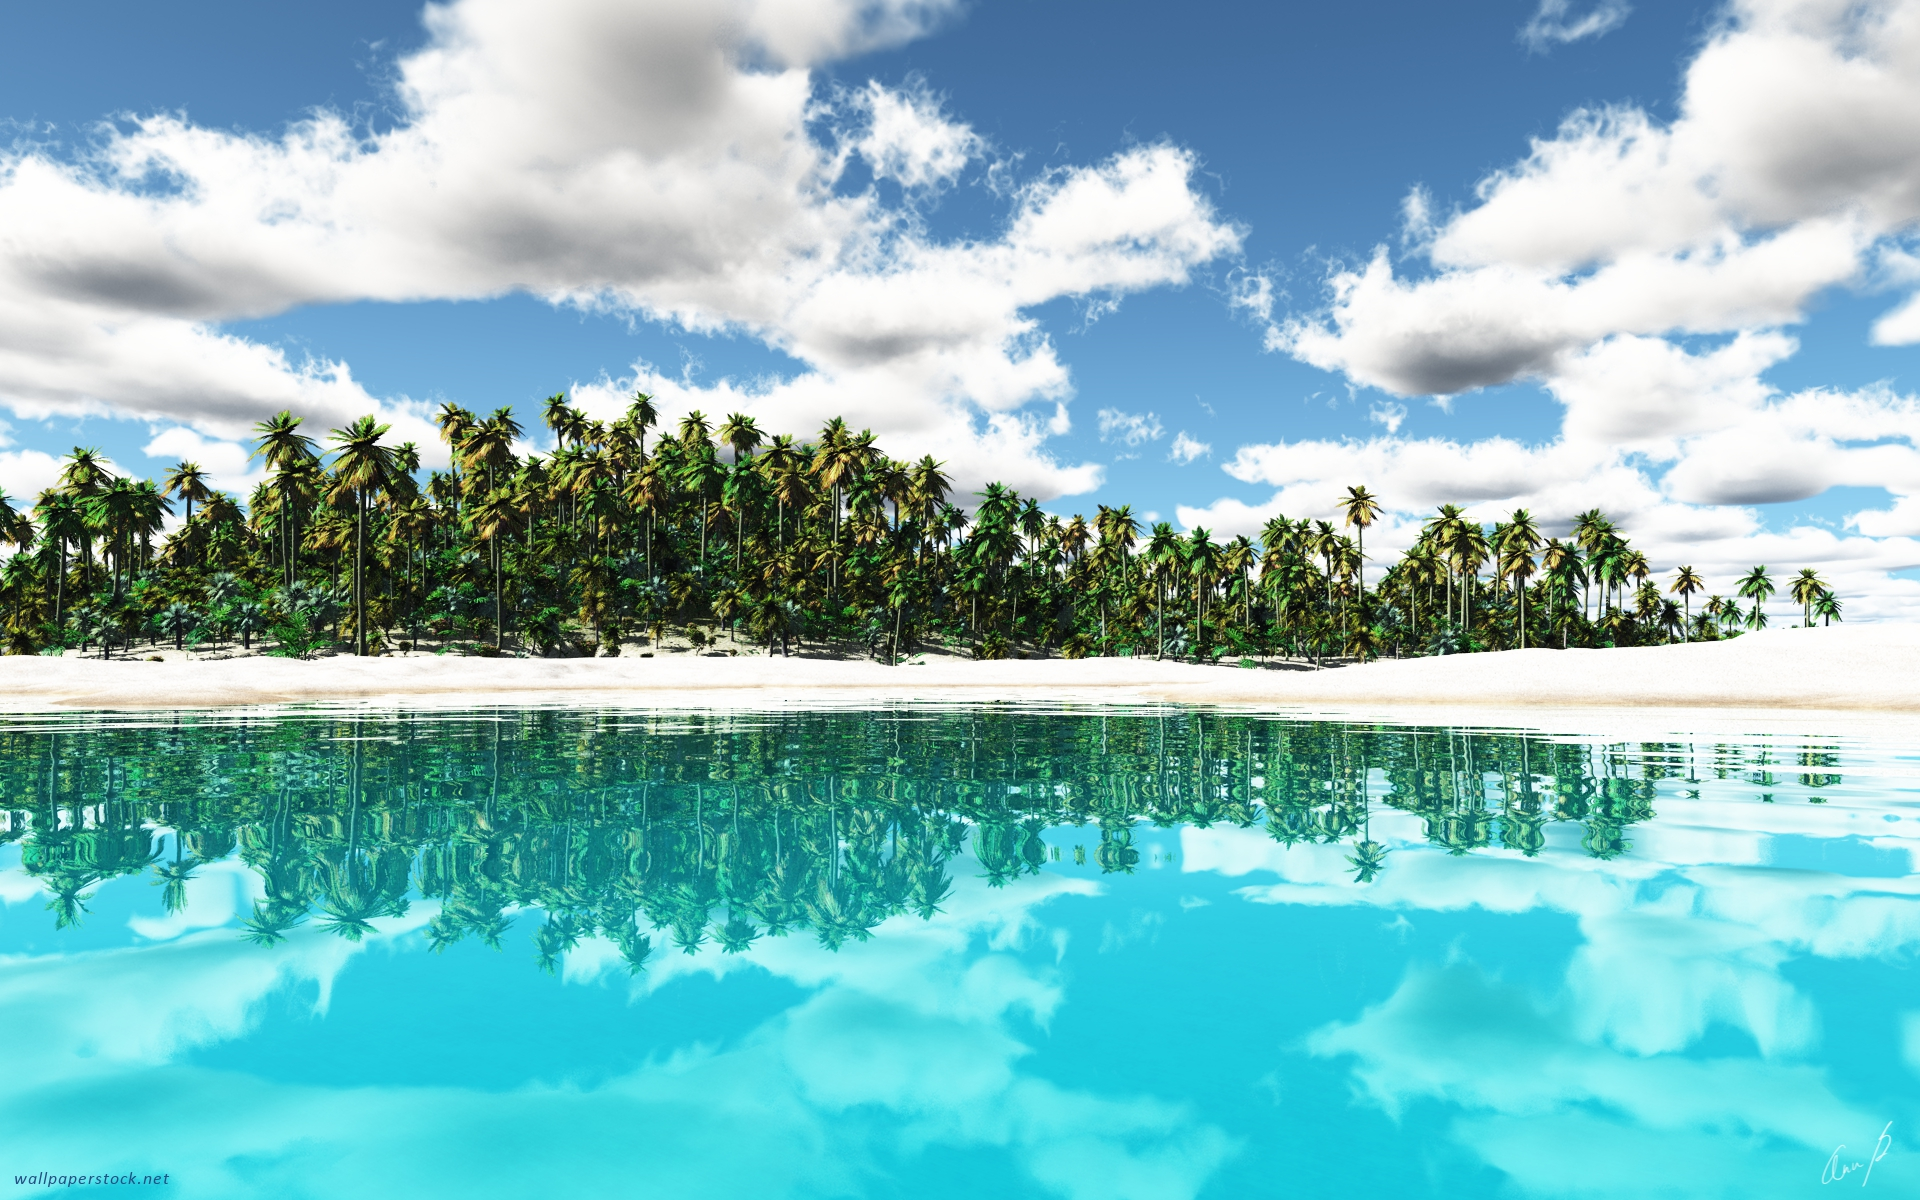 Tropical Island wallpaper - 856519